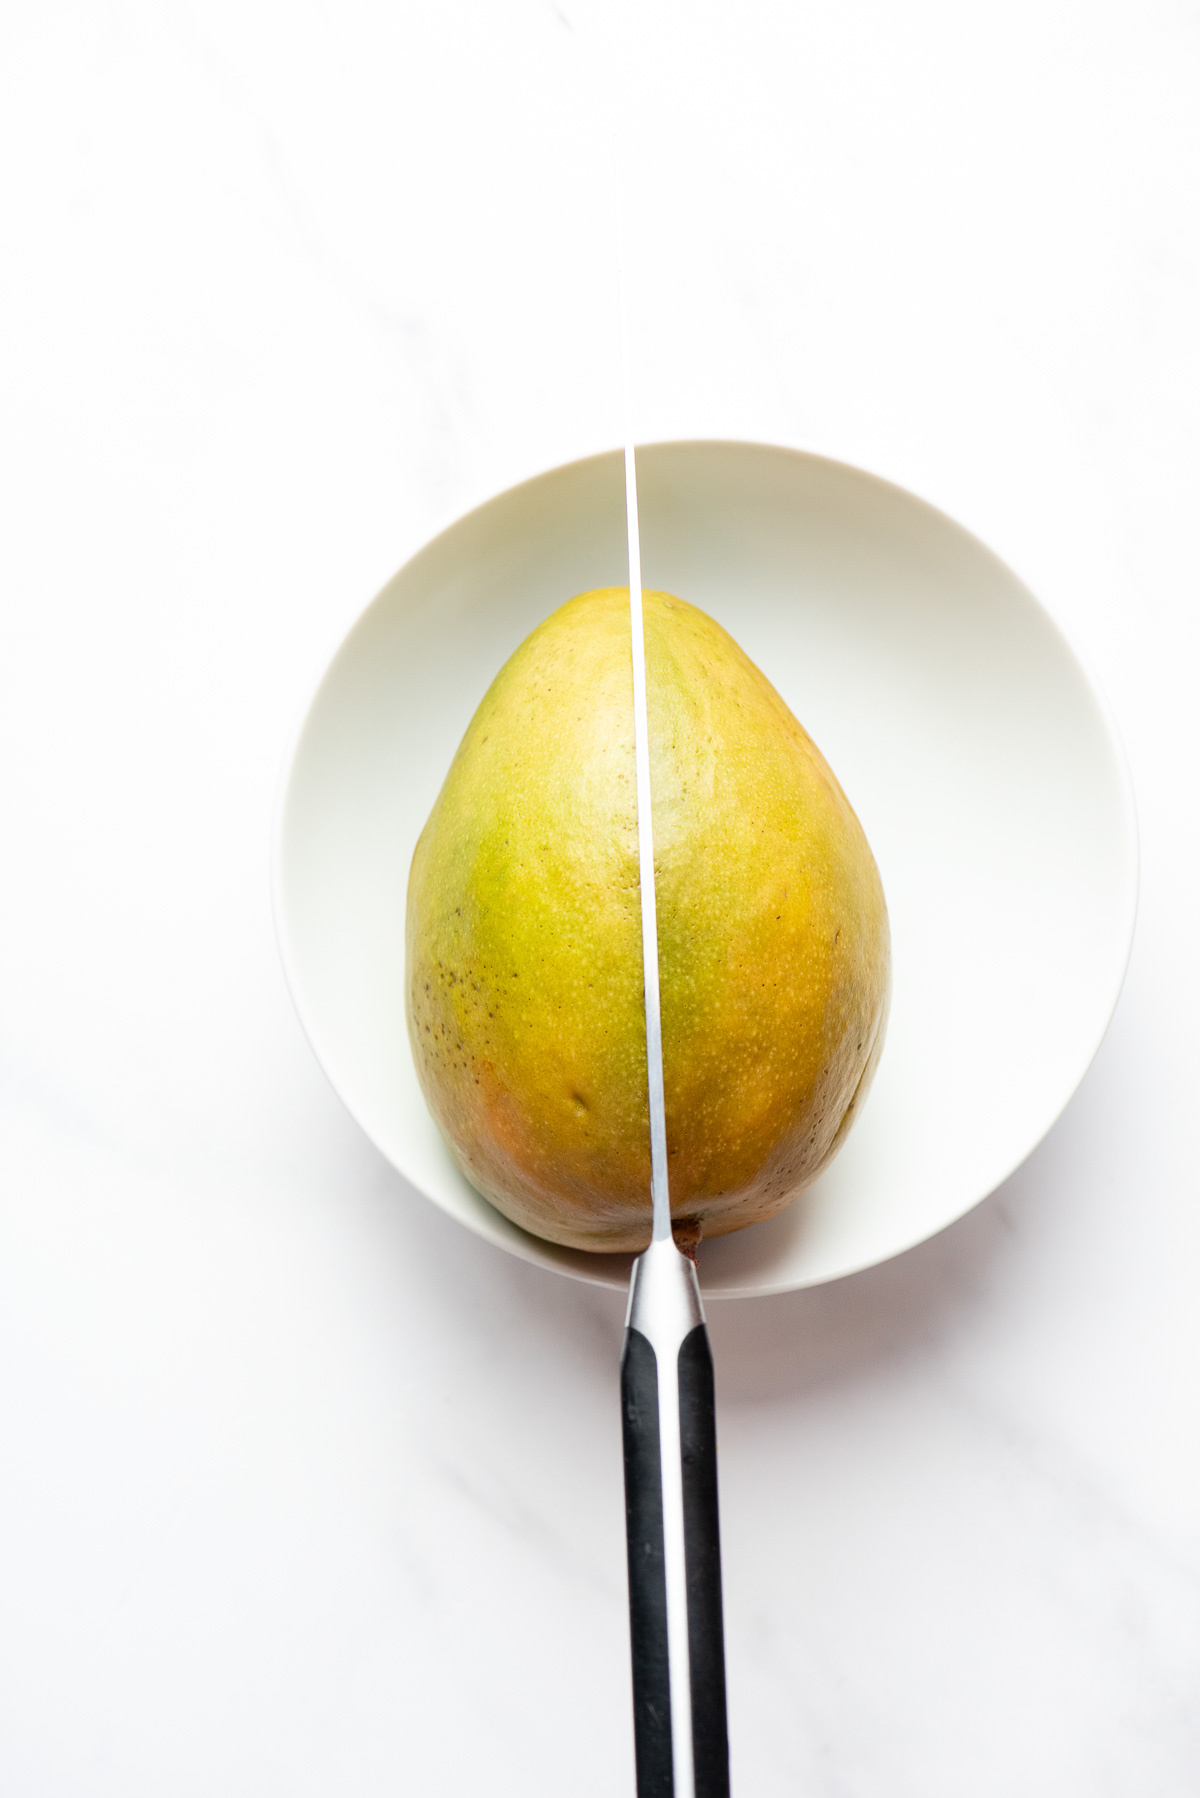 cutting a mango - knife in fruit